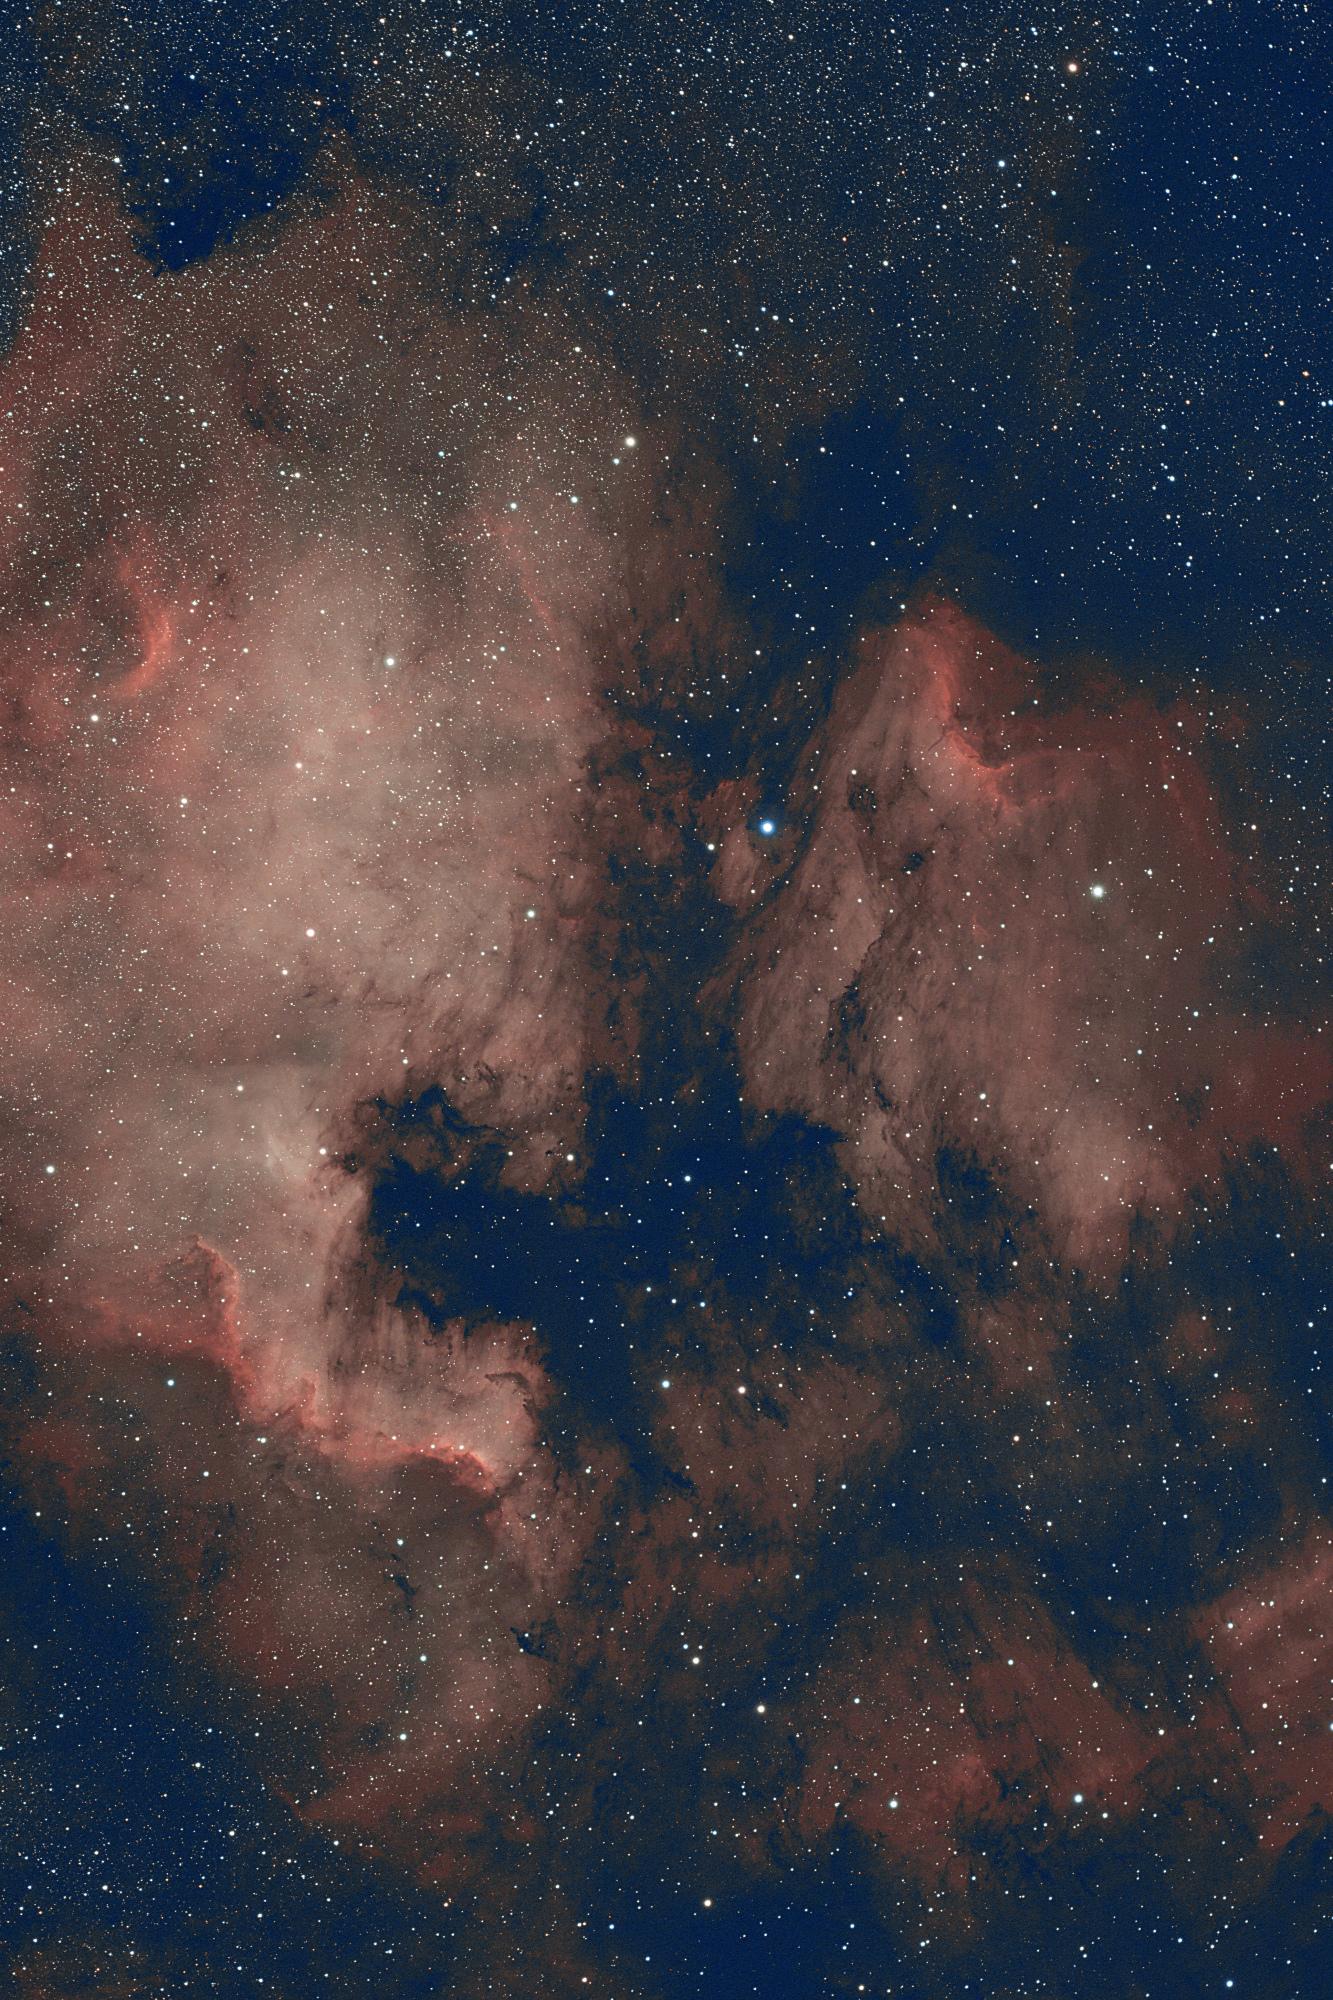 NGC7000_27x300s_55d_gain100_-20C_LX_2_GIMP_optimBVwithstarmask_net_niv.thumb.jpg.90300f1bae75adee9b24a33eb1de33f1.jpg